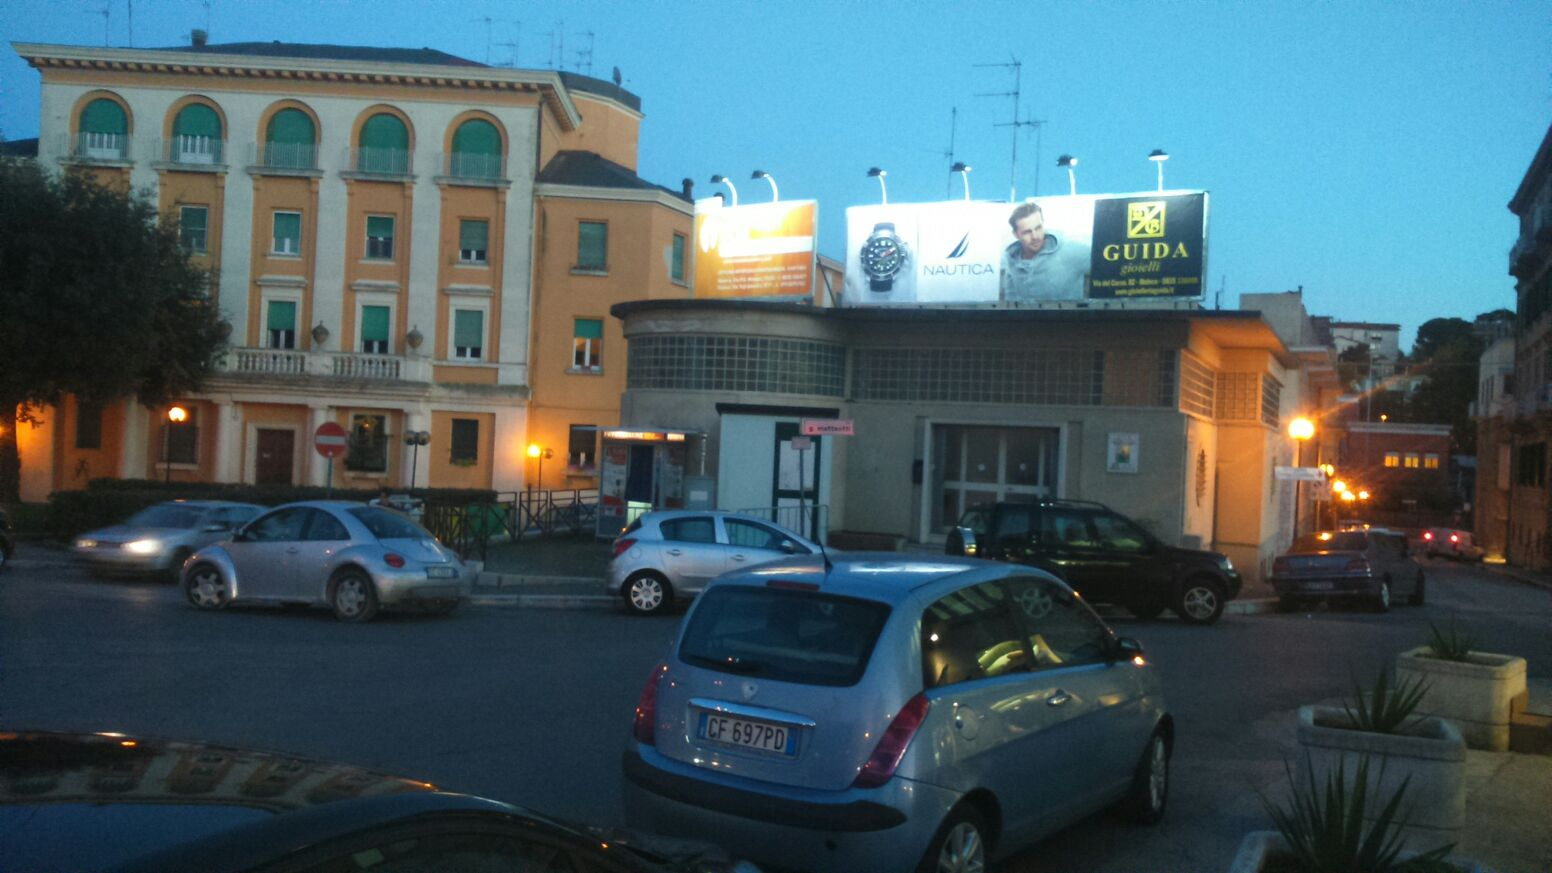 http://www.postermap.it/wp-content/uploads/2015/12/pannello-luminoso-340x200-pubblicita-outdoor-Matera-piazza-Matteooti.jpg